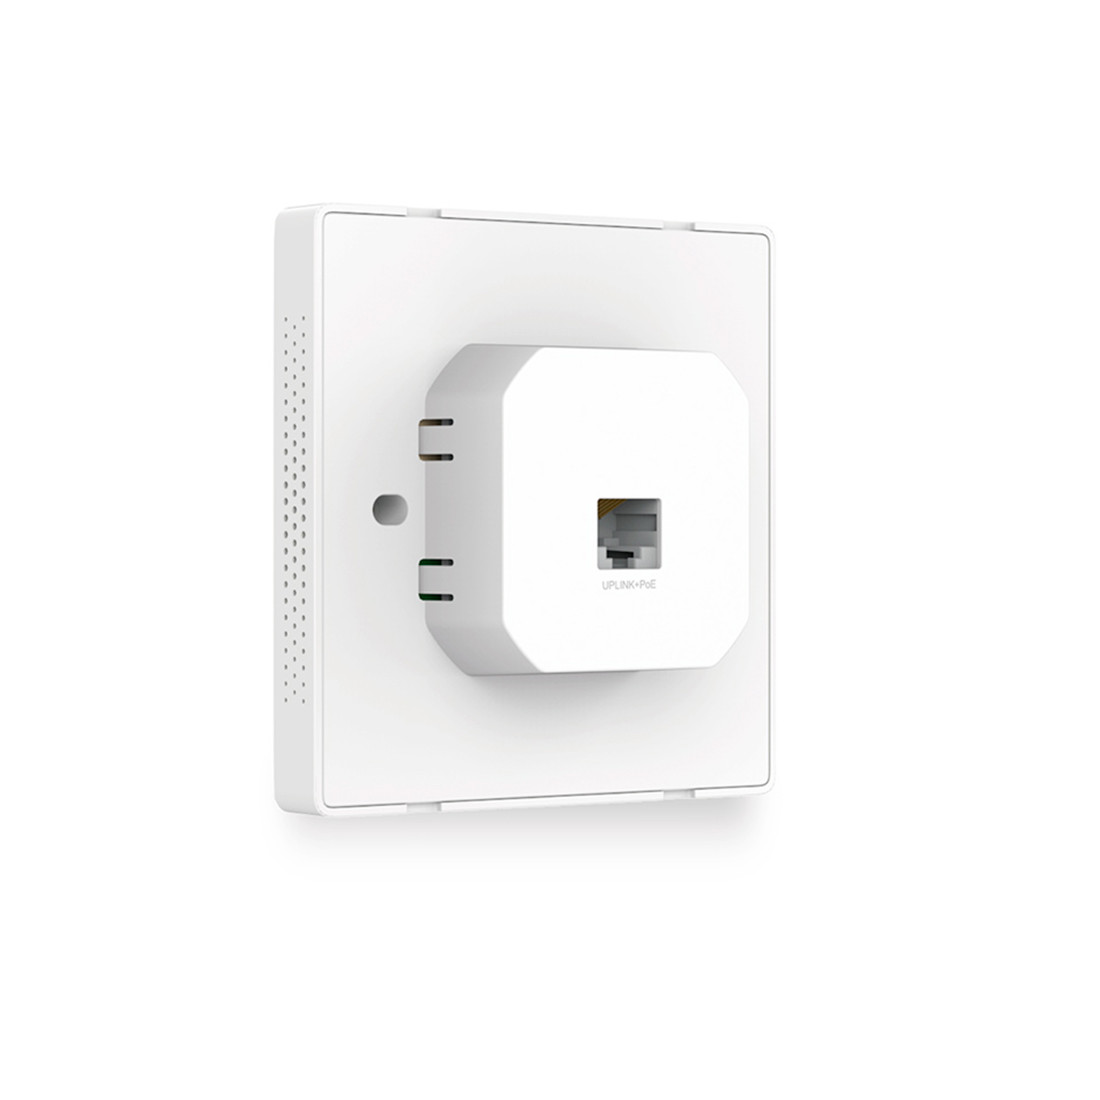 Настенная Wi-Fi точка доступа EAP115-Wall